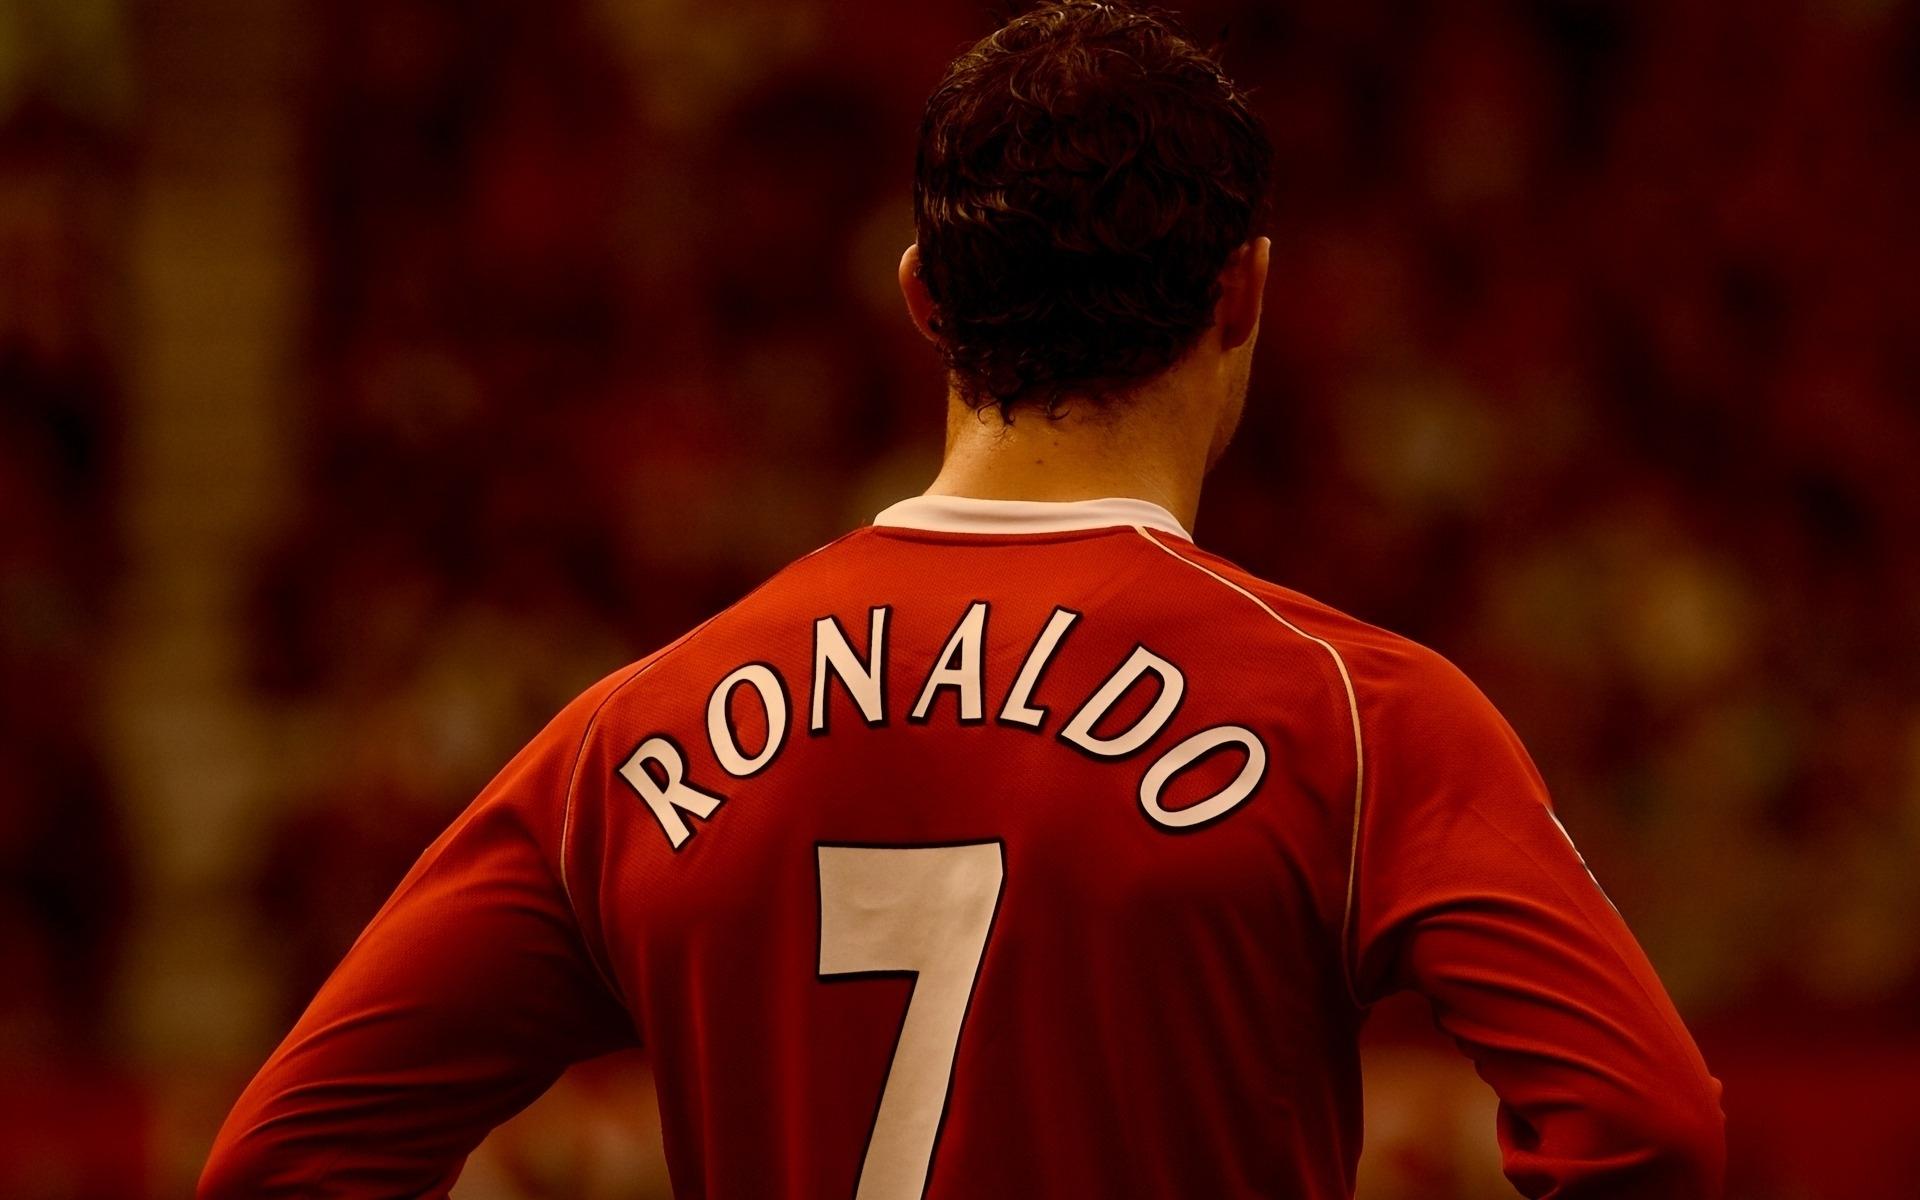 Спорт футбол ronaldo спина форма обои